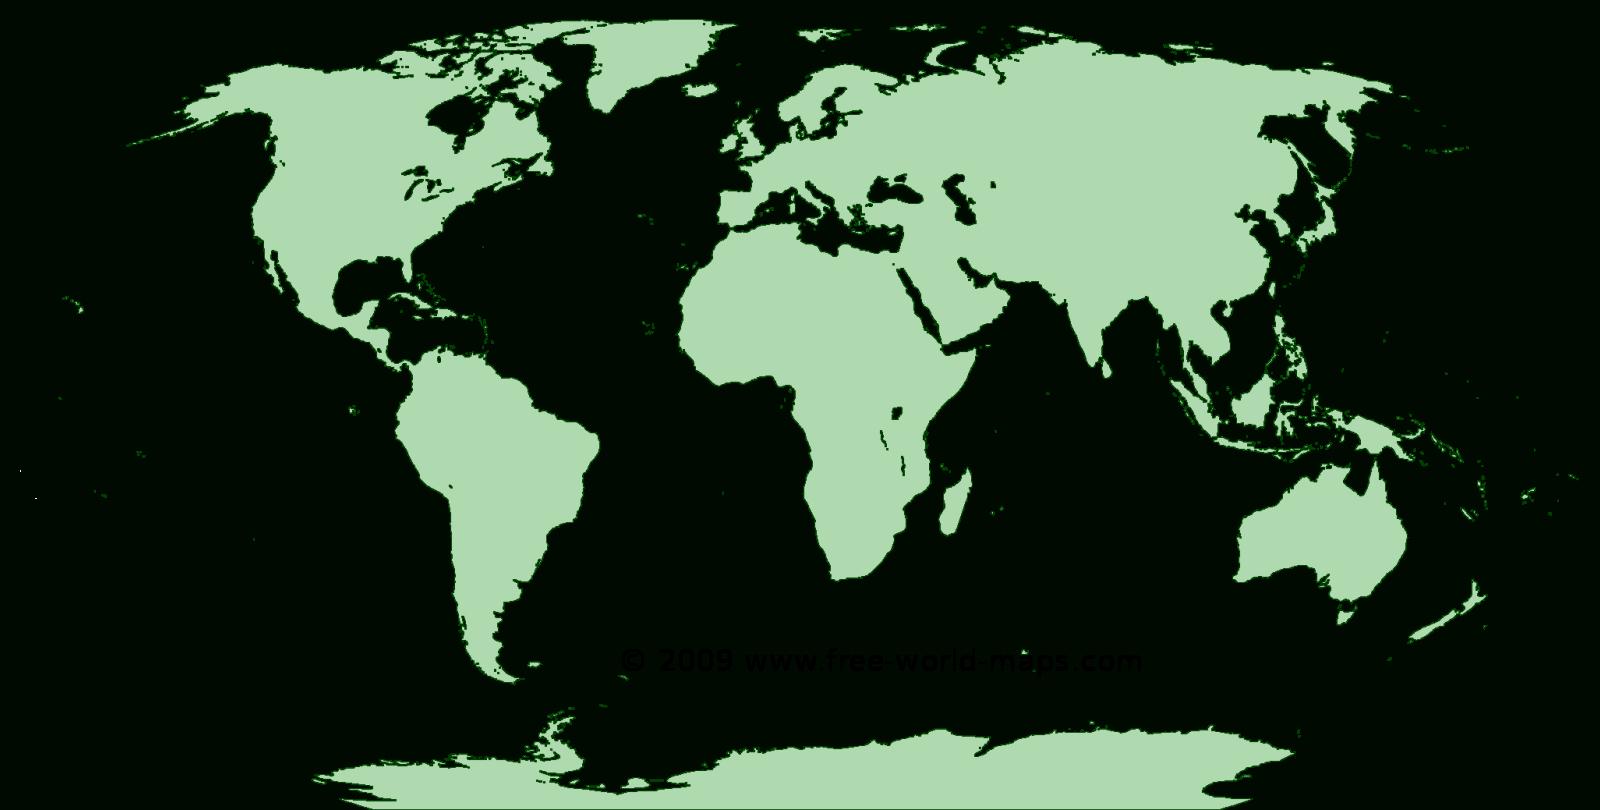 Printable Green-Transparent Blank Outline World Map C4 | Free World Maps - Free Printable World Map Images